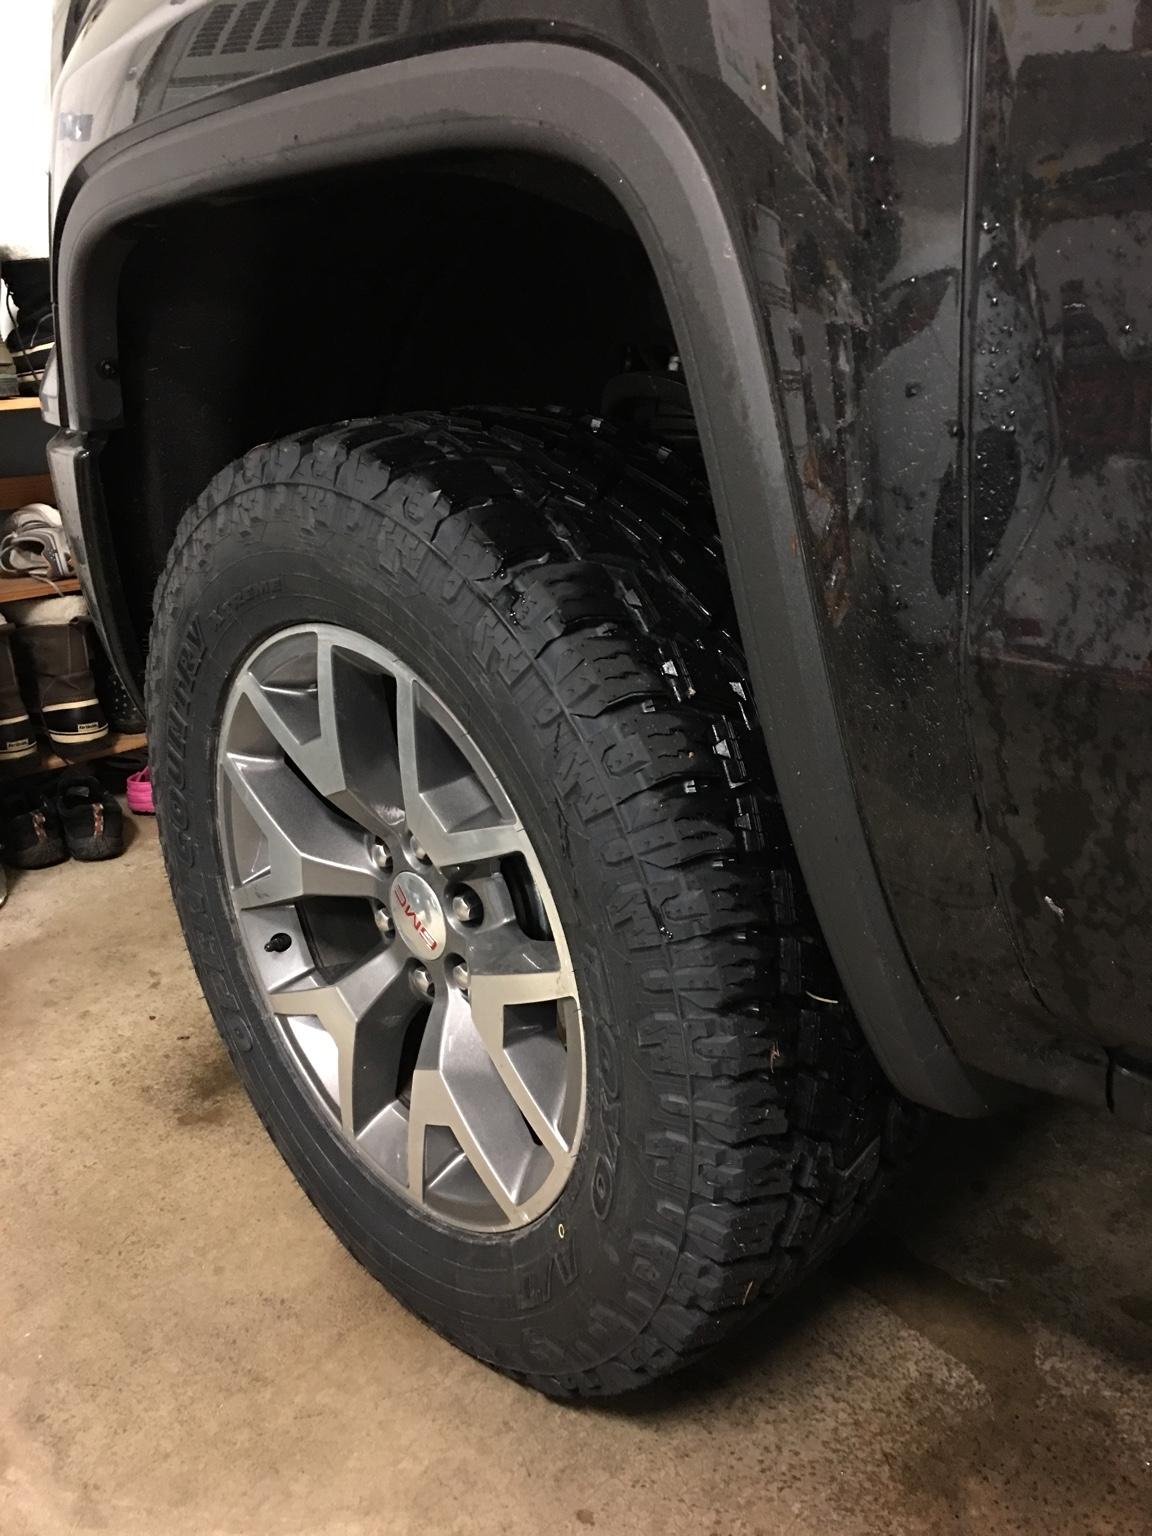 La Sierra Tires >> New tires, 295/60/20 Toyo AT2 Extreme - 2014-2018 Silverado & Sierra Mods - GM-Trucks.com